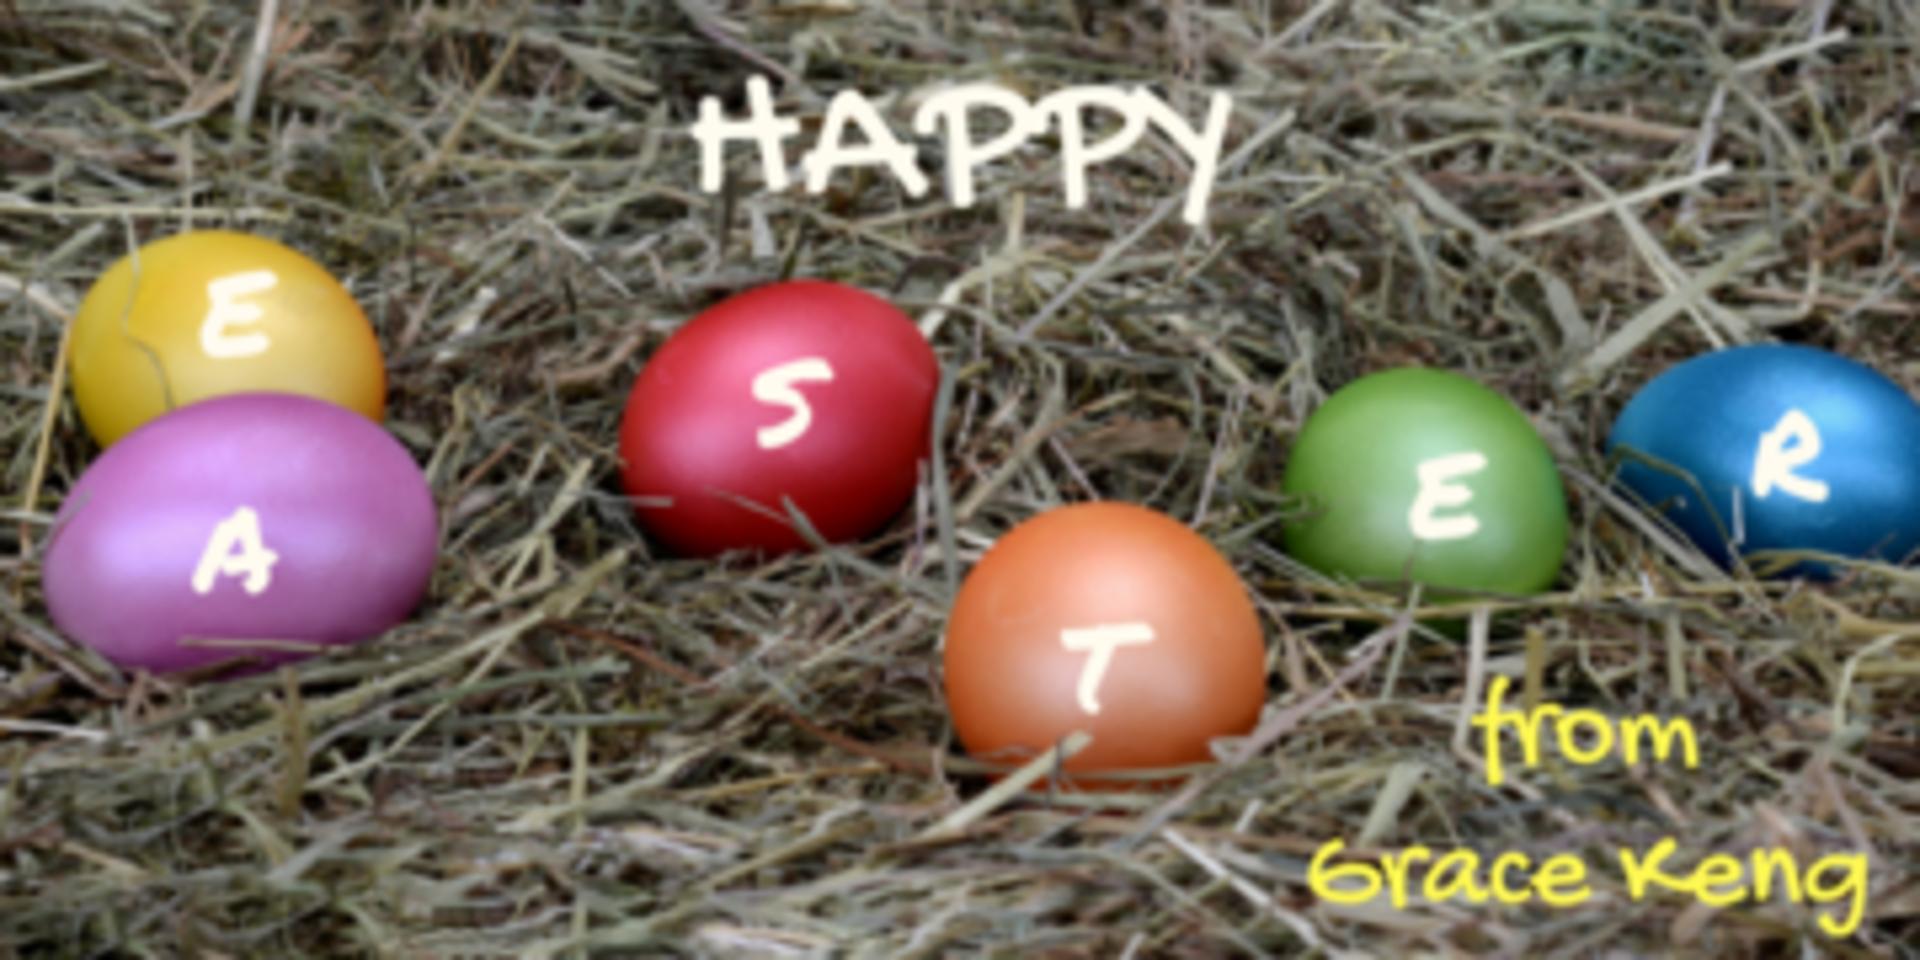 2017 Santa Clara Easter egg Hunting schedule